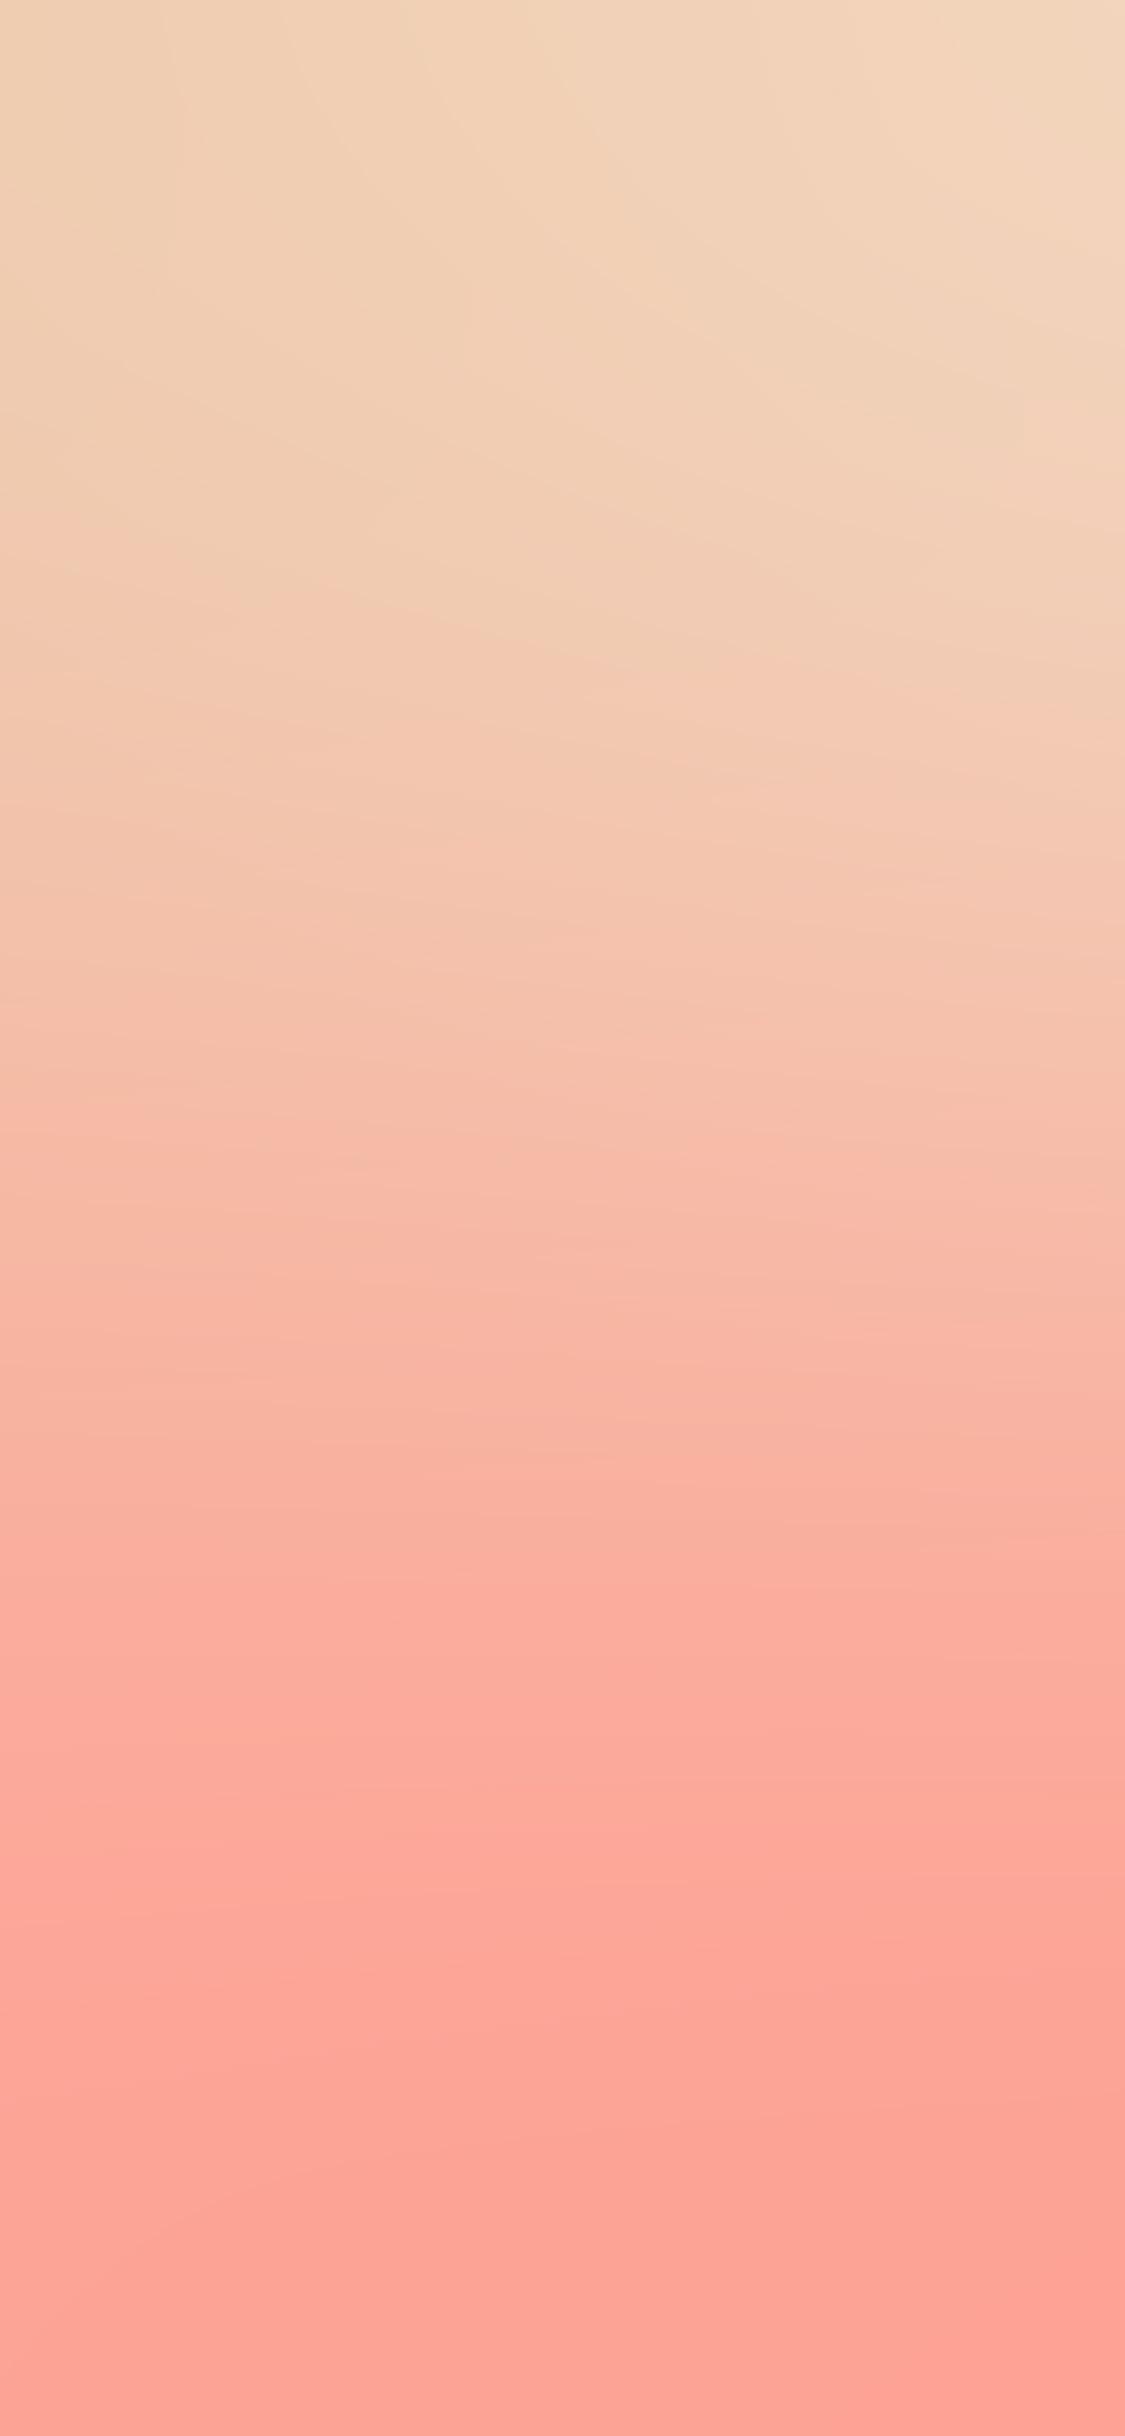 iPhonexpapers.com-Apple-iPhone-wallpaper-sn92-orange-love-young-blur-gradation